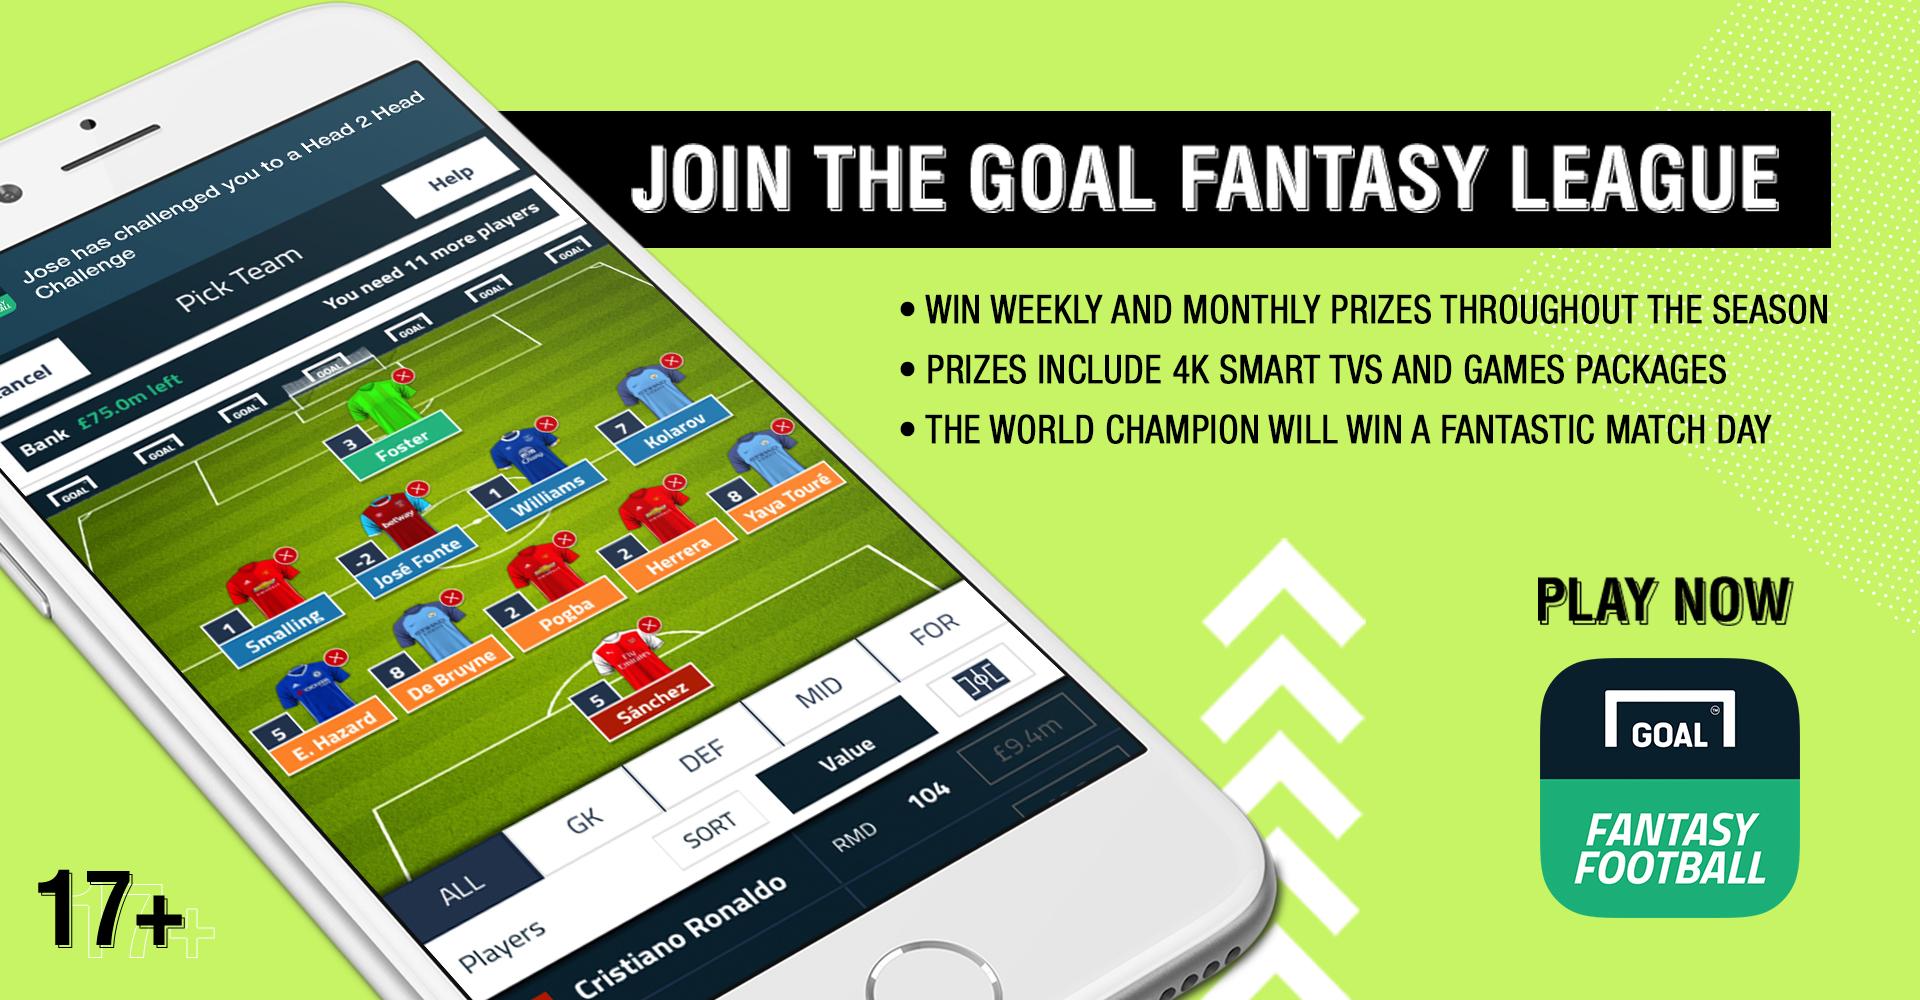 Goal-Fantasy-Football-StartPlayingNow